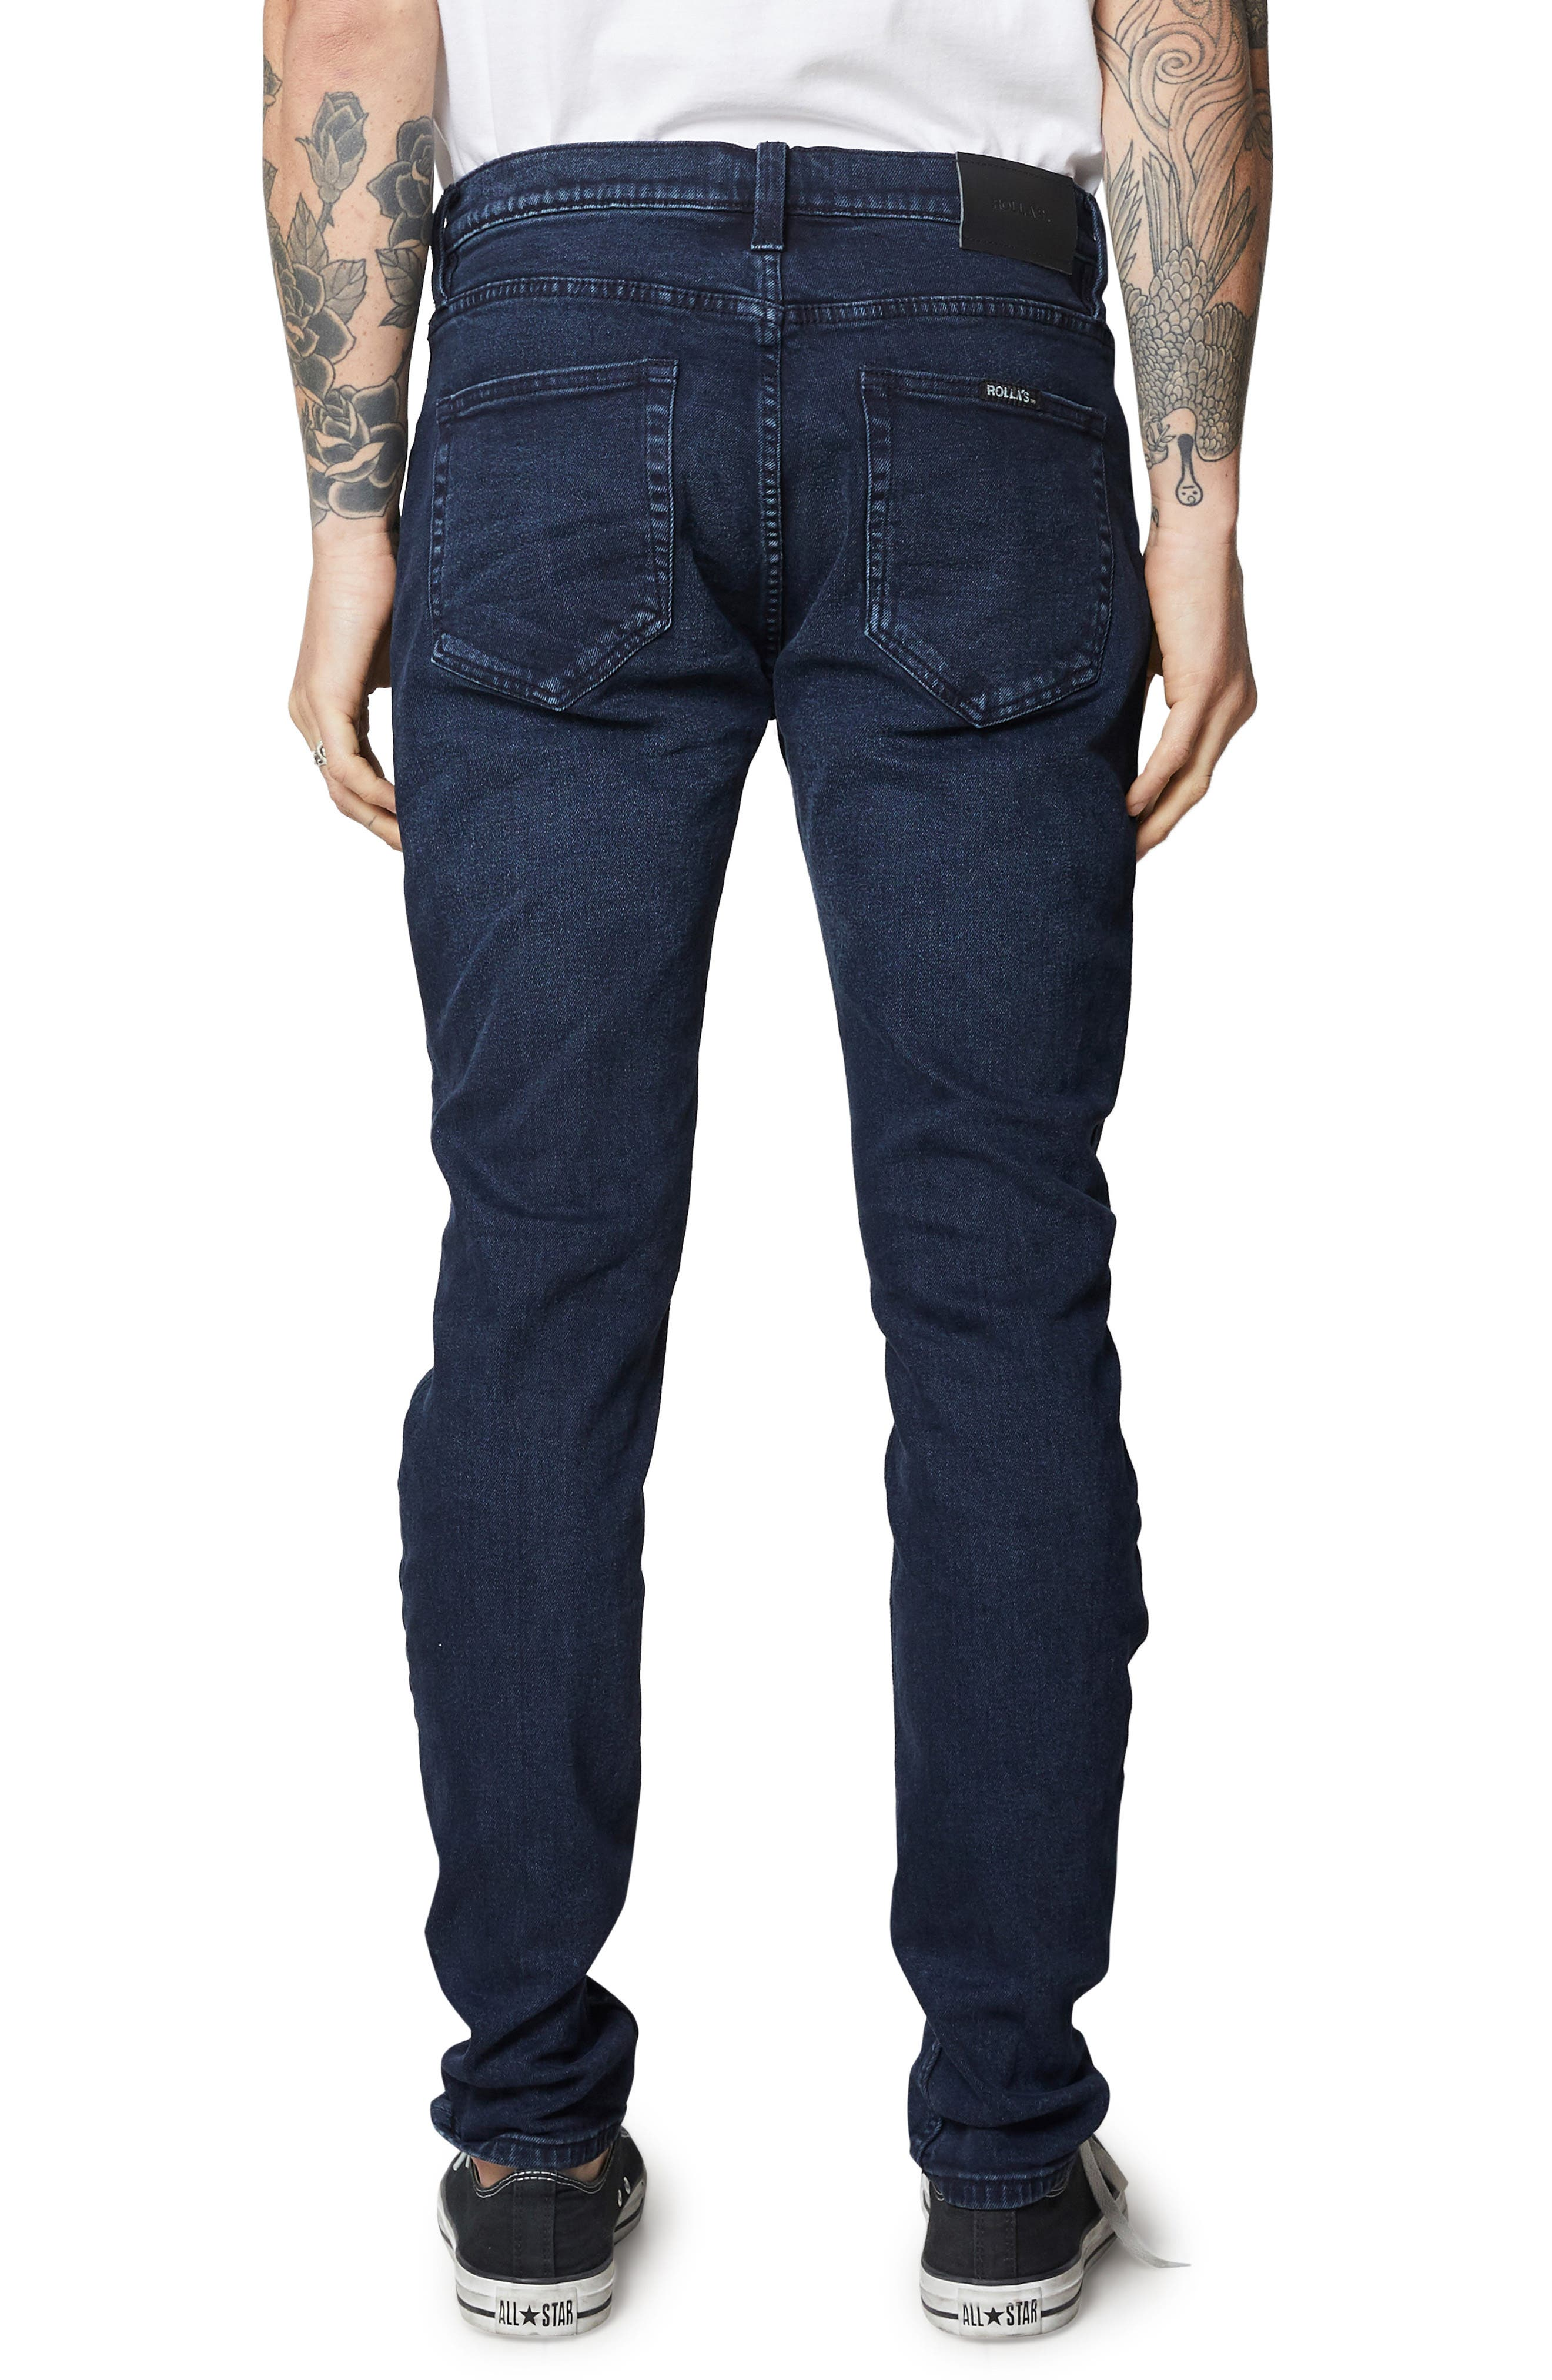 Stinger Skinny Fit Jeans,                             Alternate thumbnail 2, color,                             STONE FREE BLACK